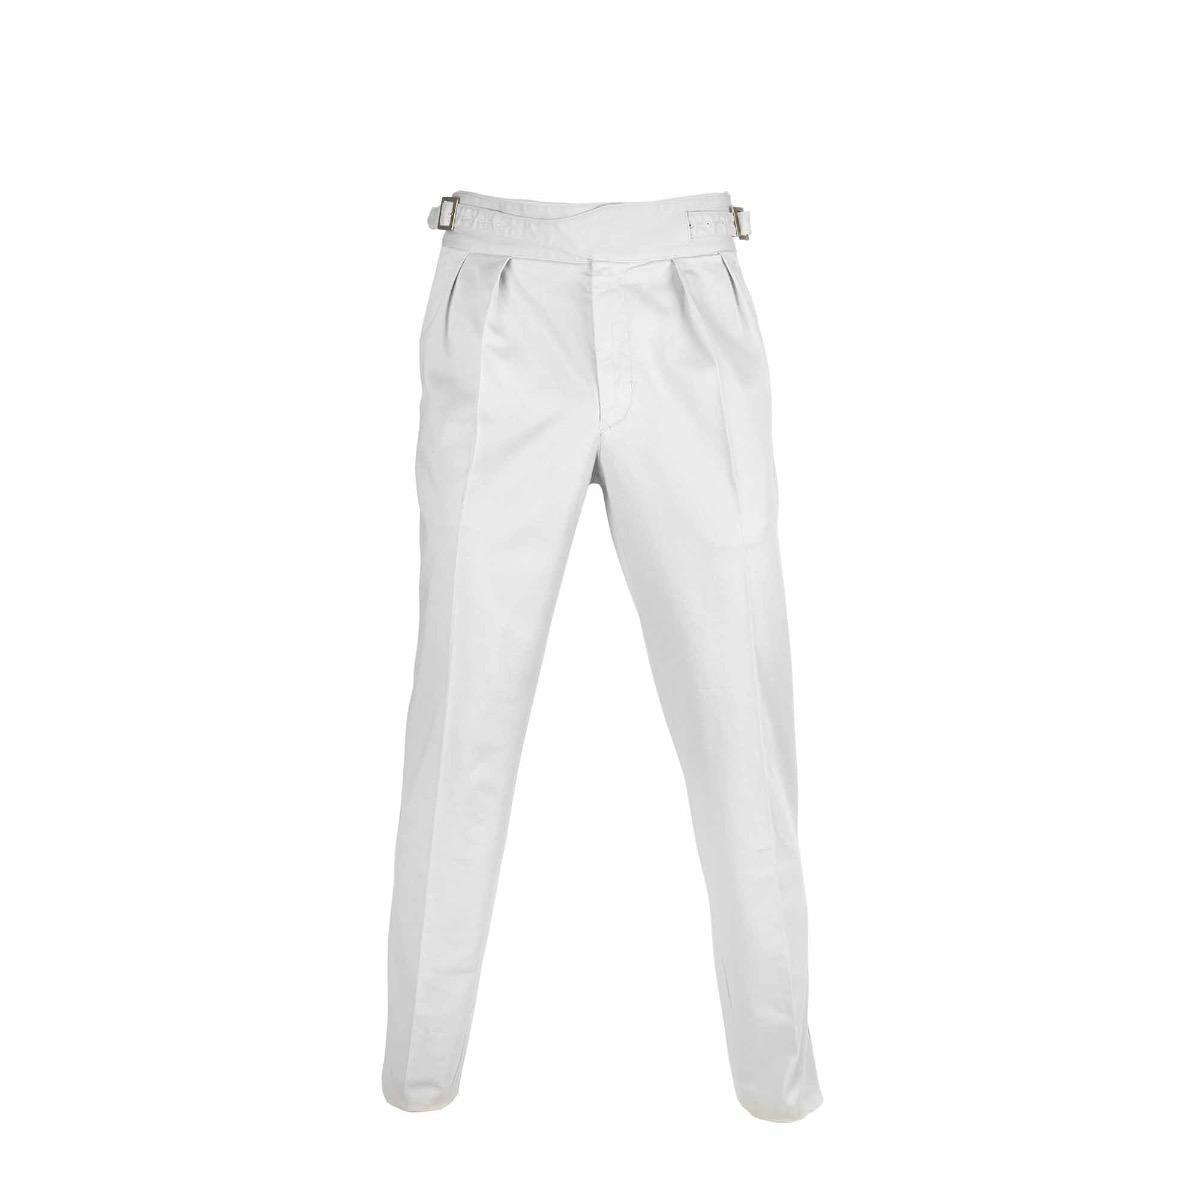 Black Manny Pleated Cotton Trousers Rubinacci MrGrXNR